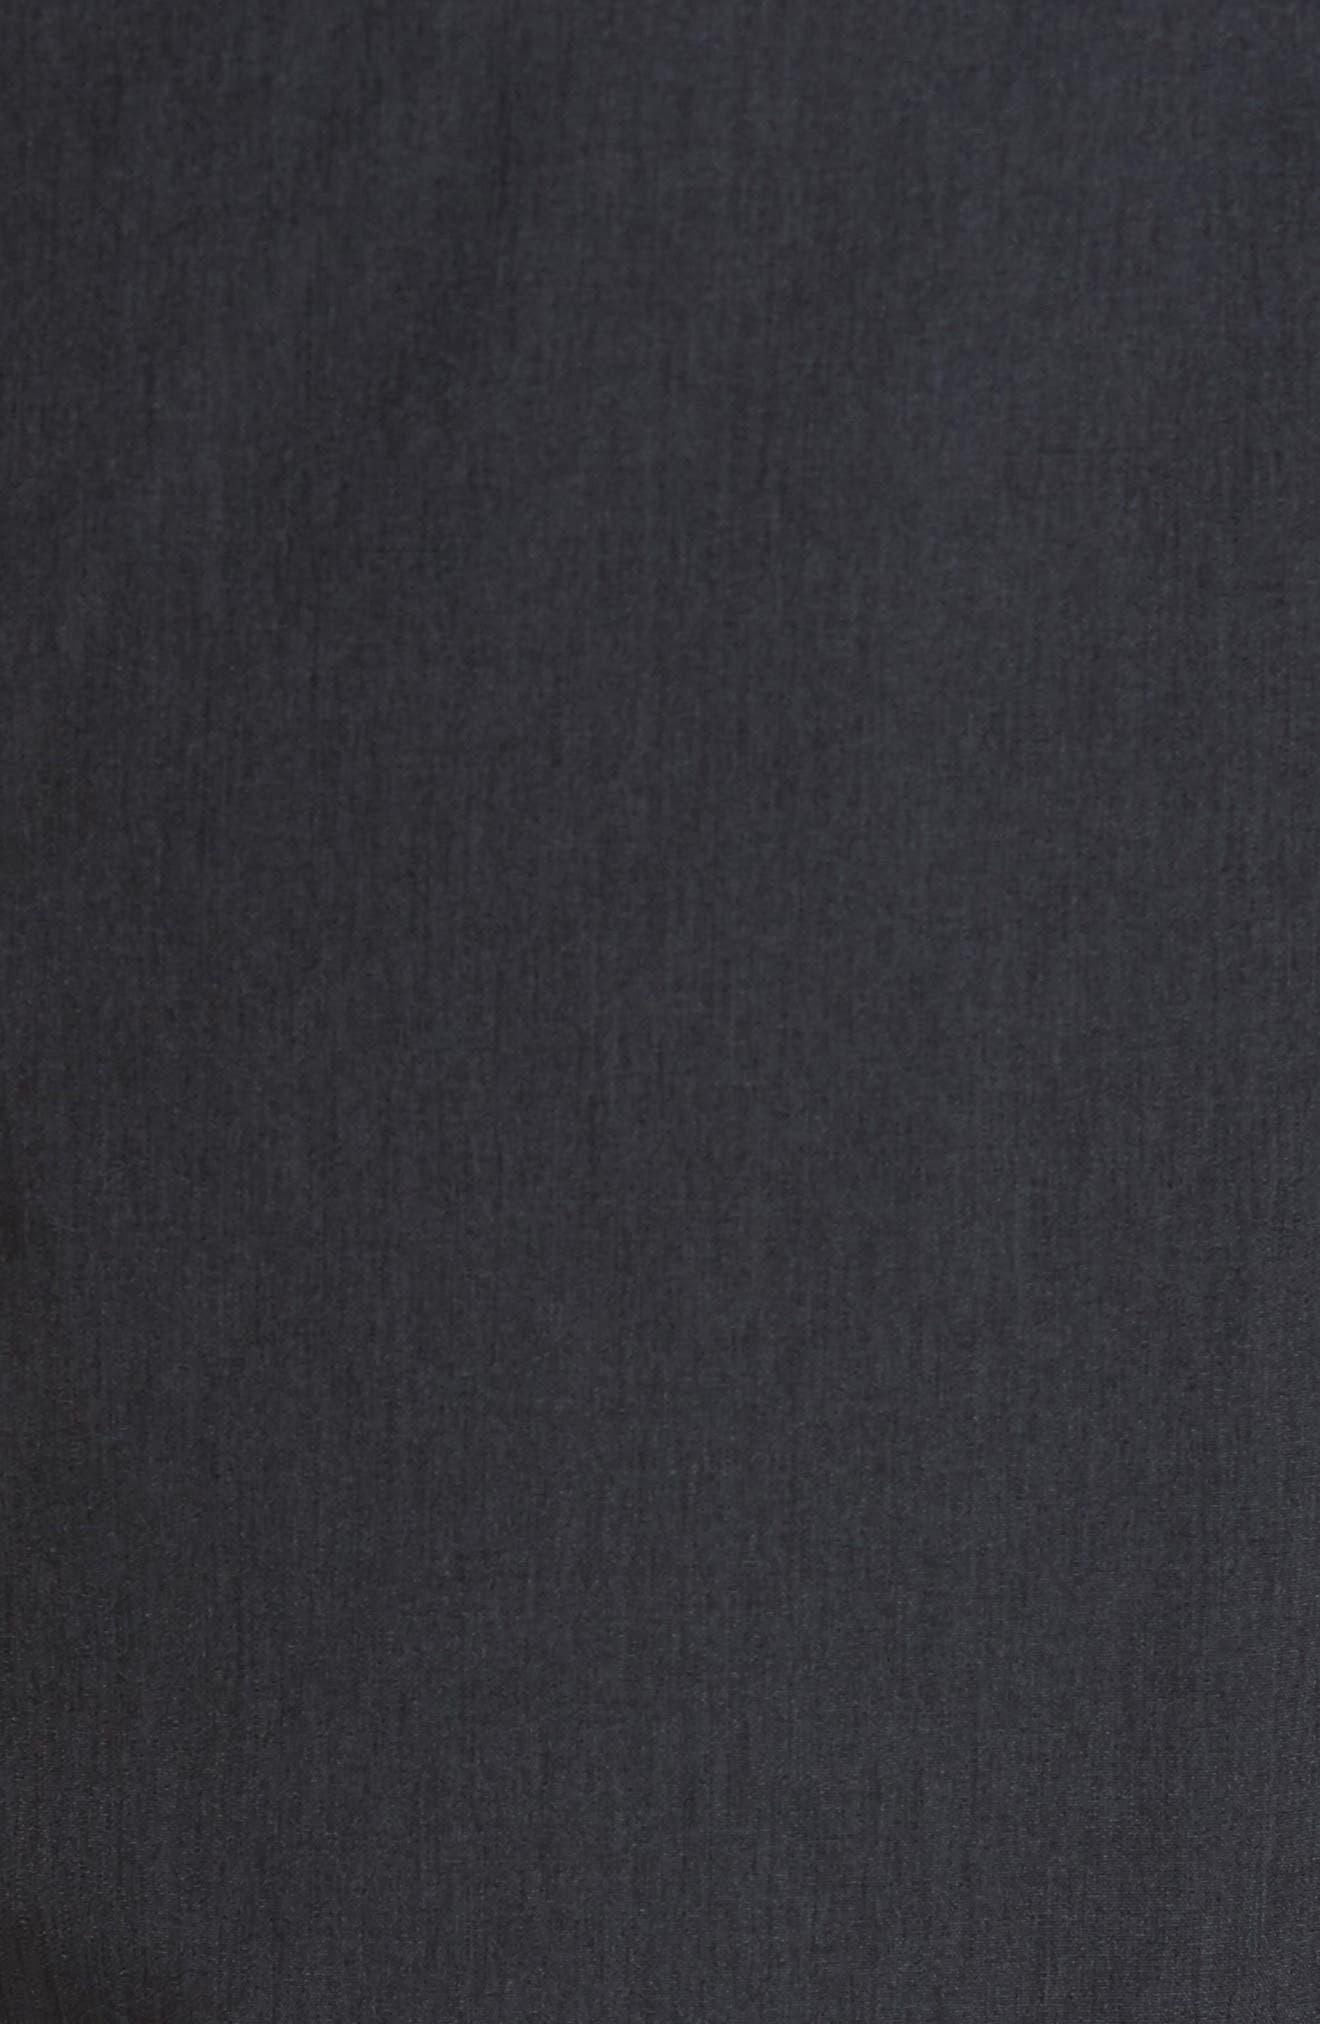 Banks Performance Hybrid Shorts,                             Alternate thumbnail 5, color,                             Black Linen Texture